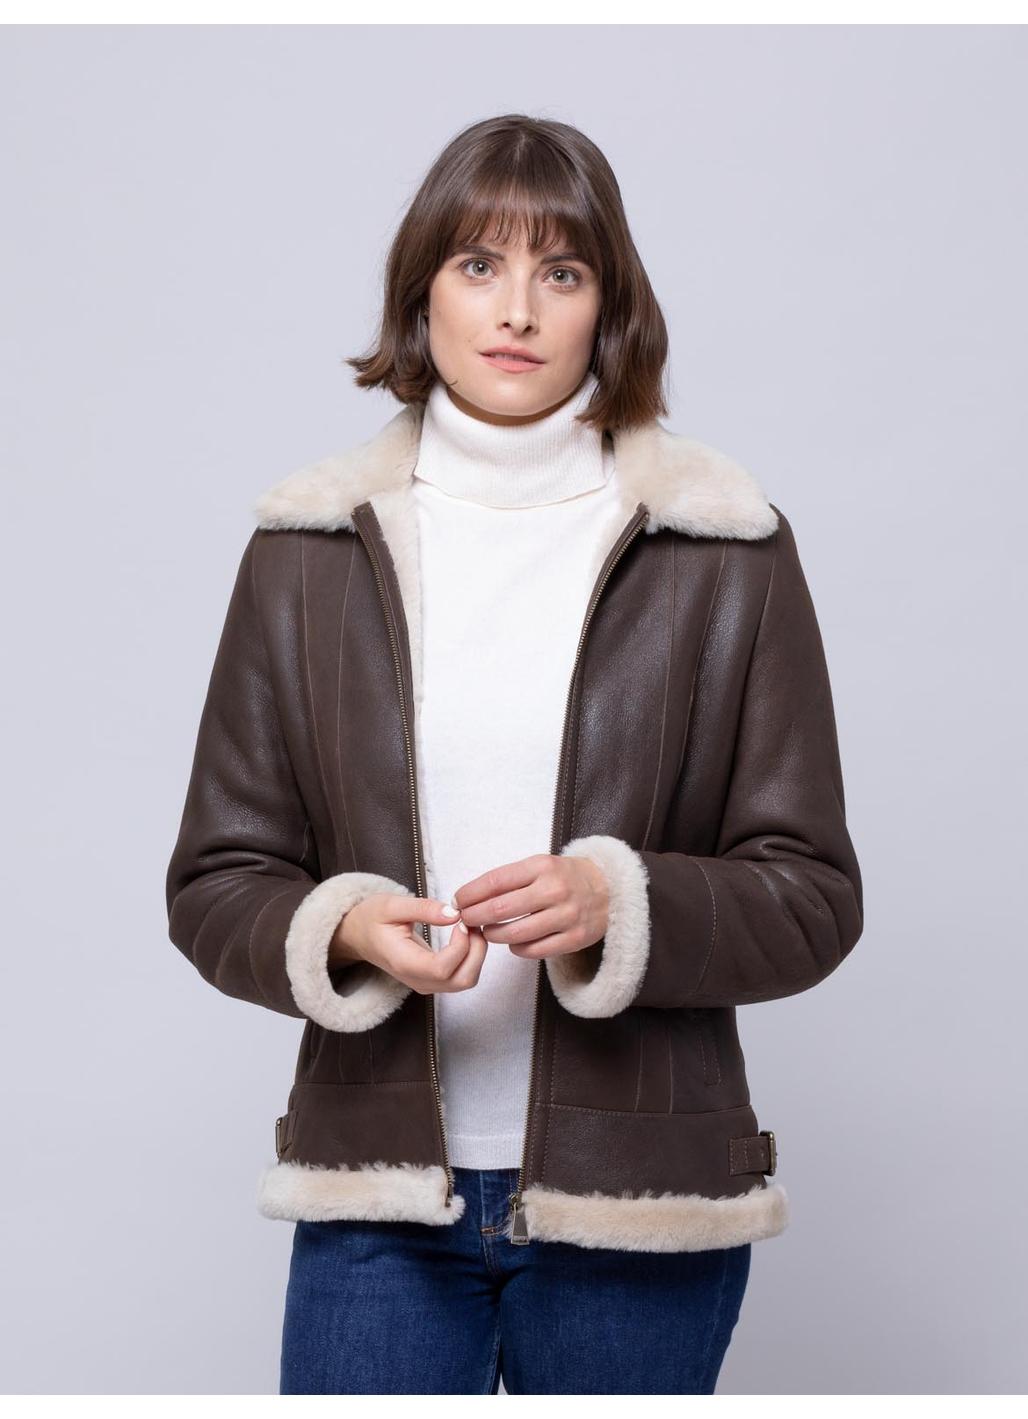 Cartmel Sheepskin Jacket in Chocolate Brown